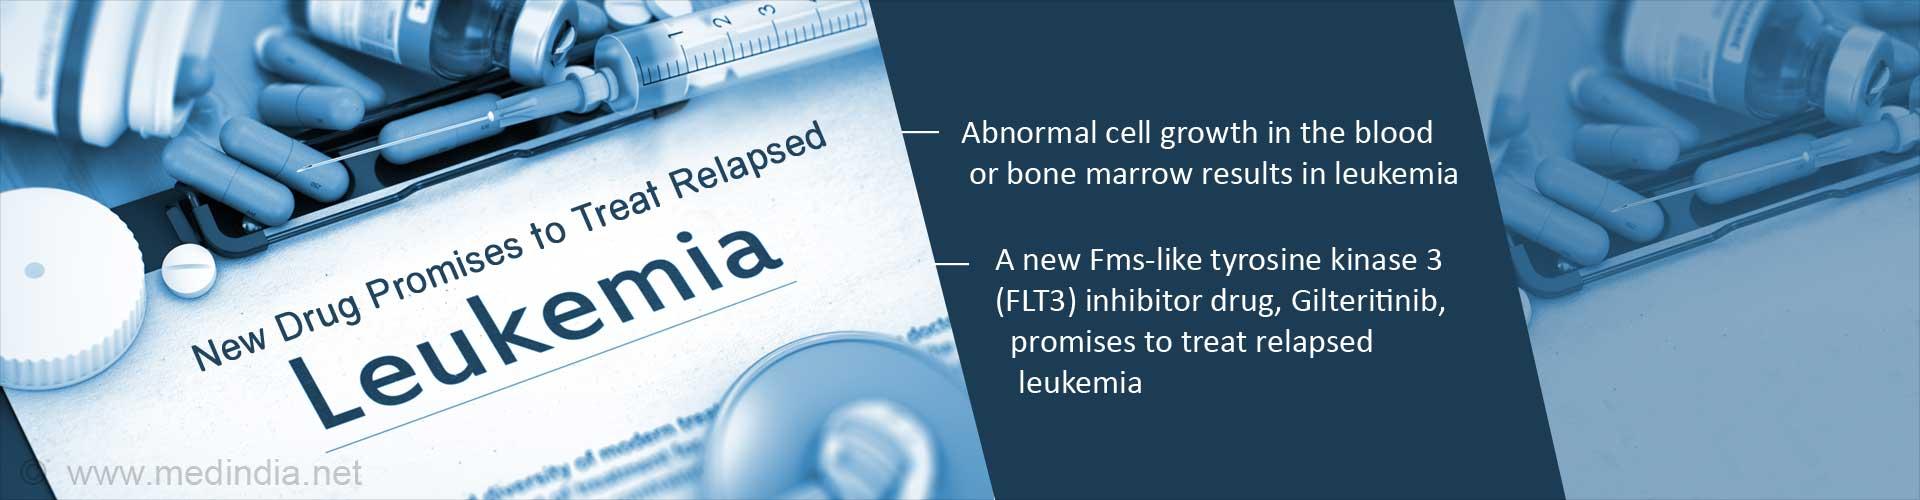 Gilteritinib Drug: New Inhibitor Offers Hope in Relapsed Leukemia